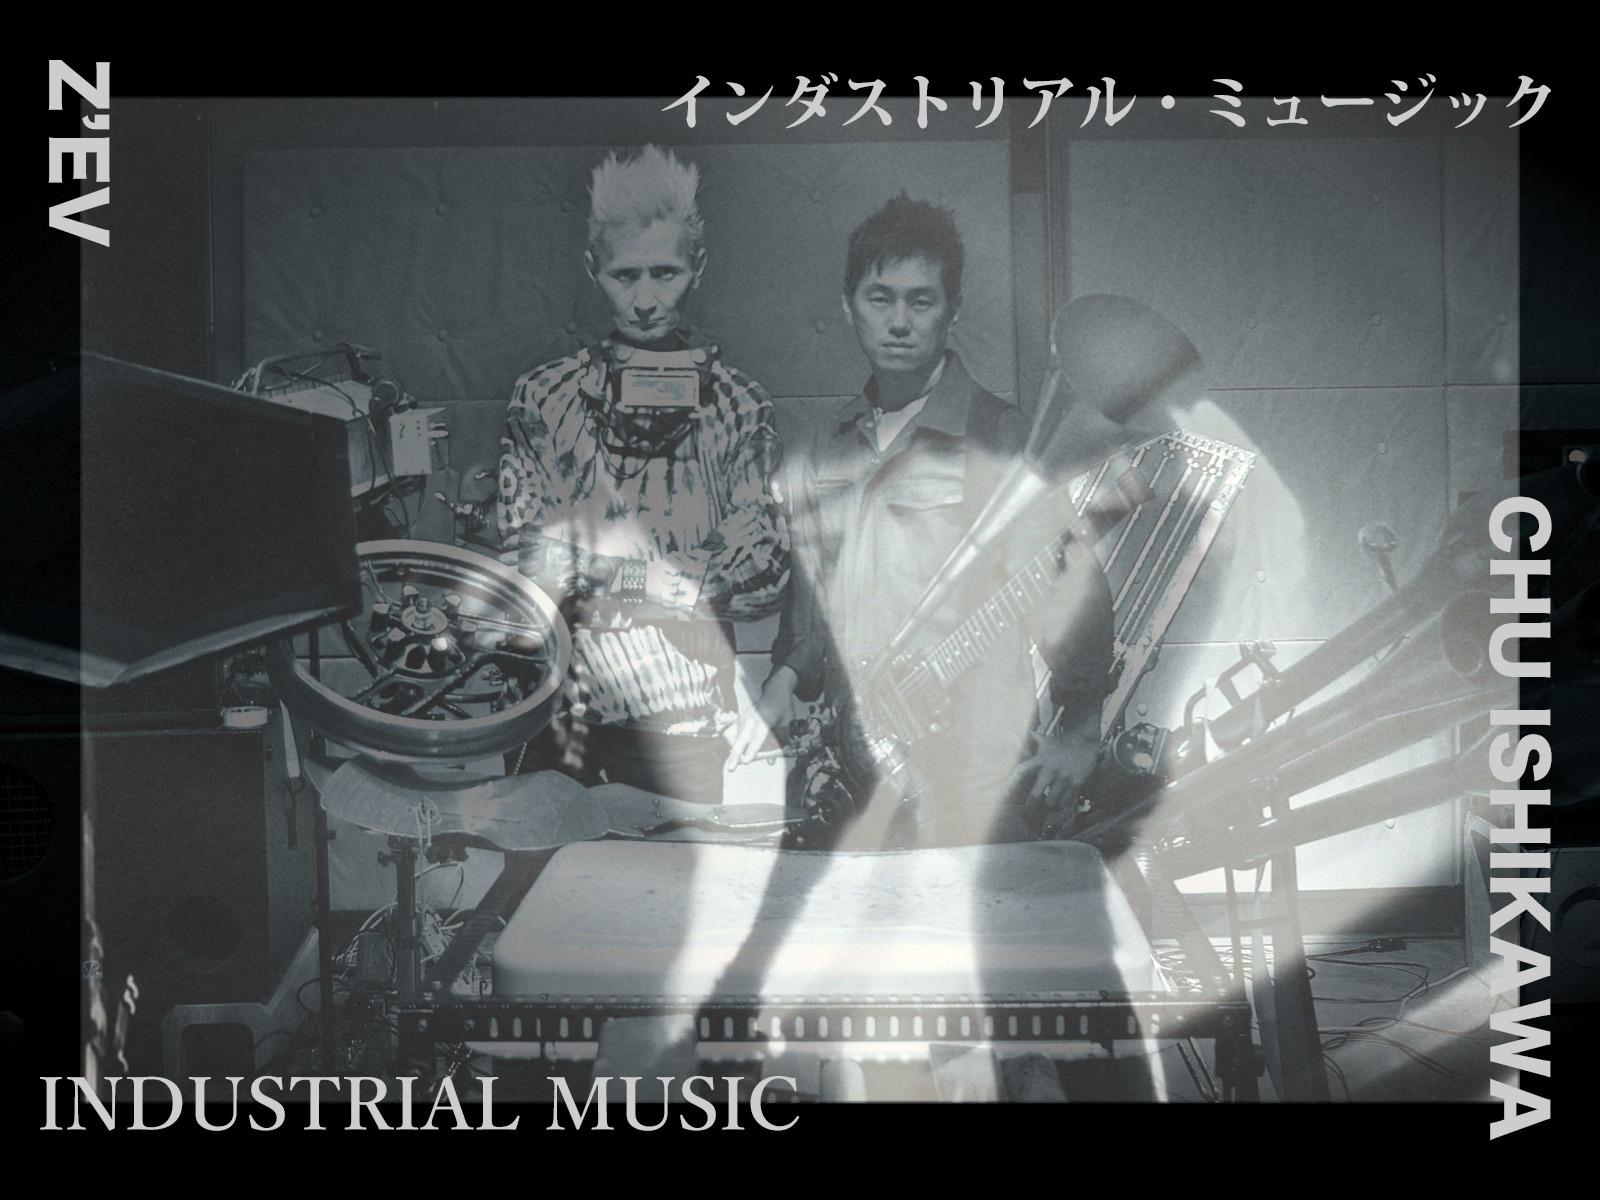 Z'EV & 石川忠 Industrial Music